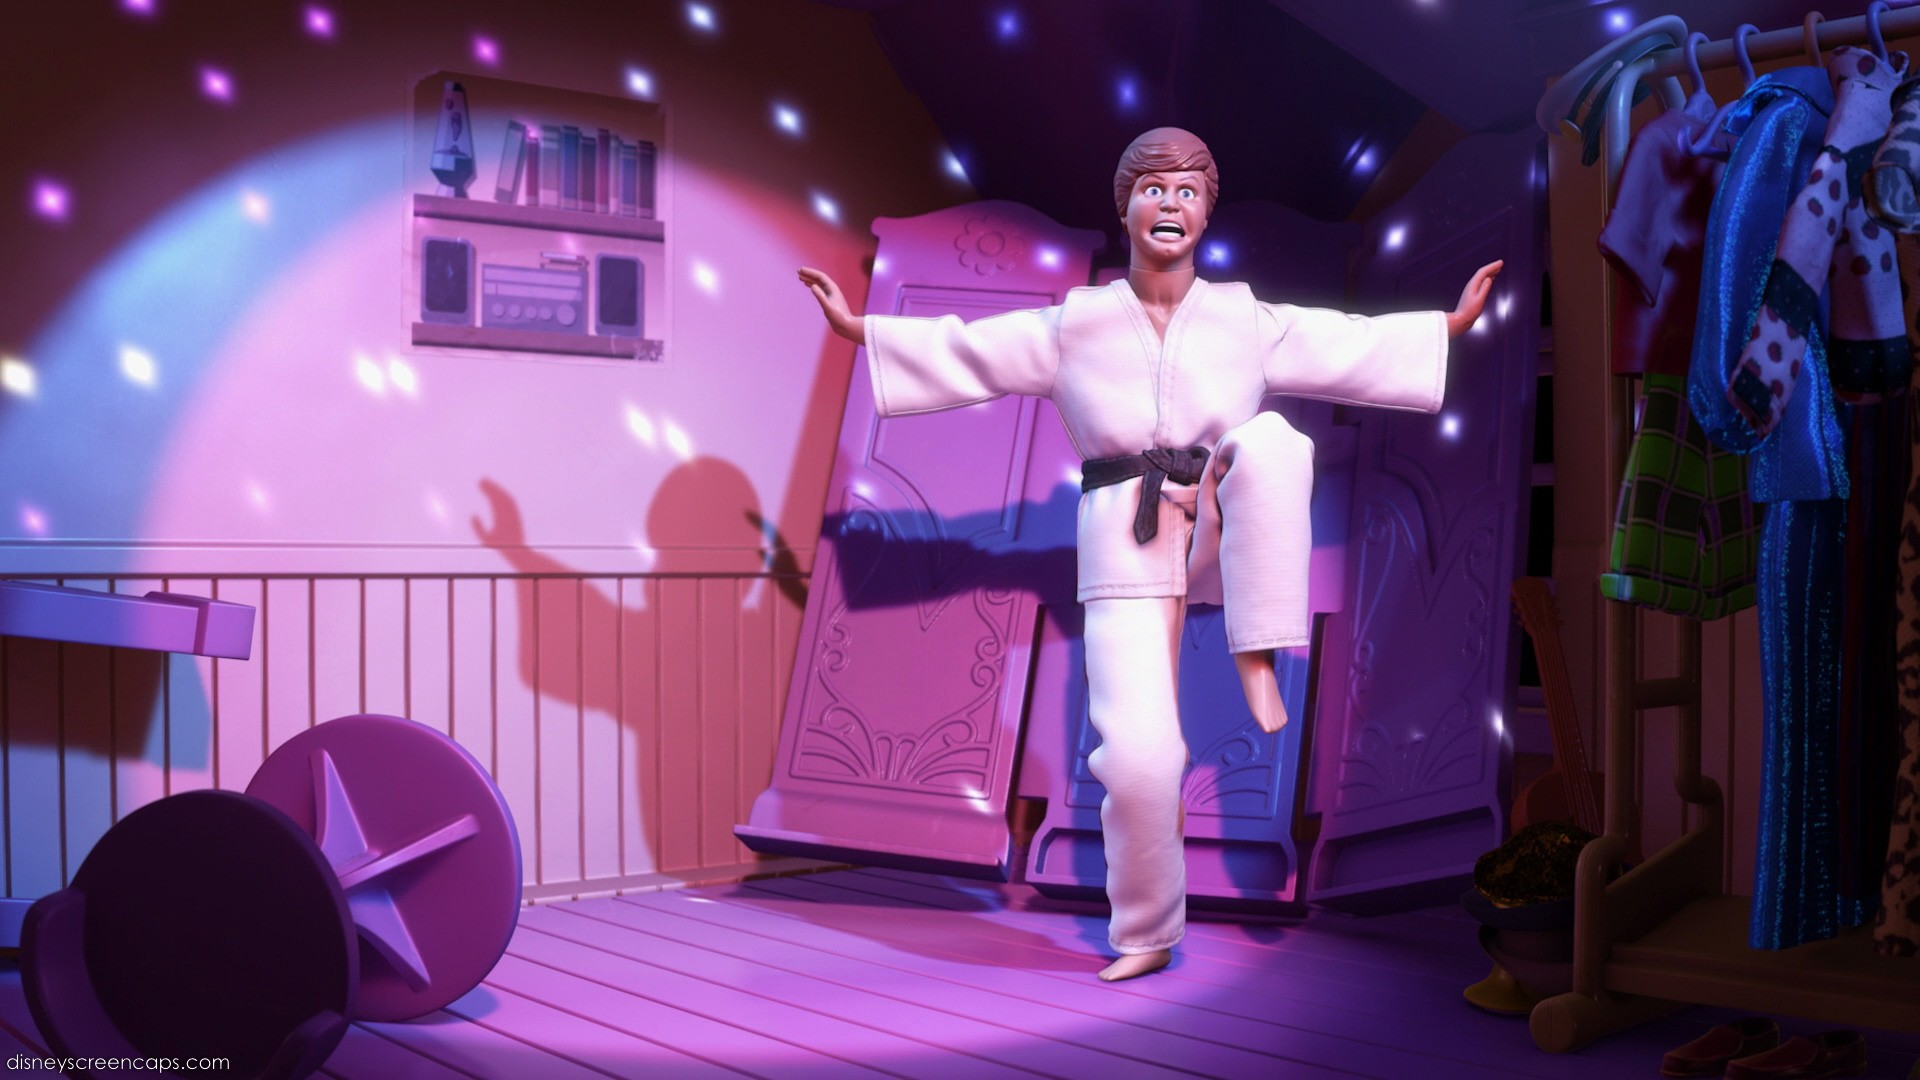 Ken in Taekwondo Suit